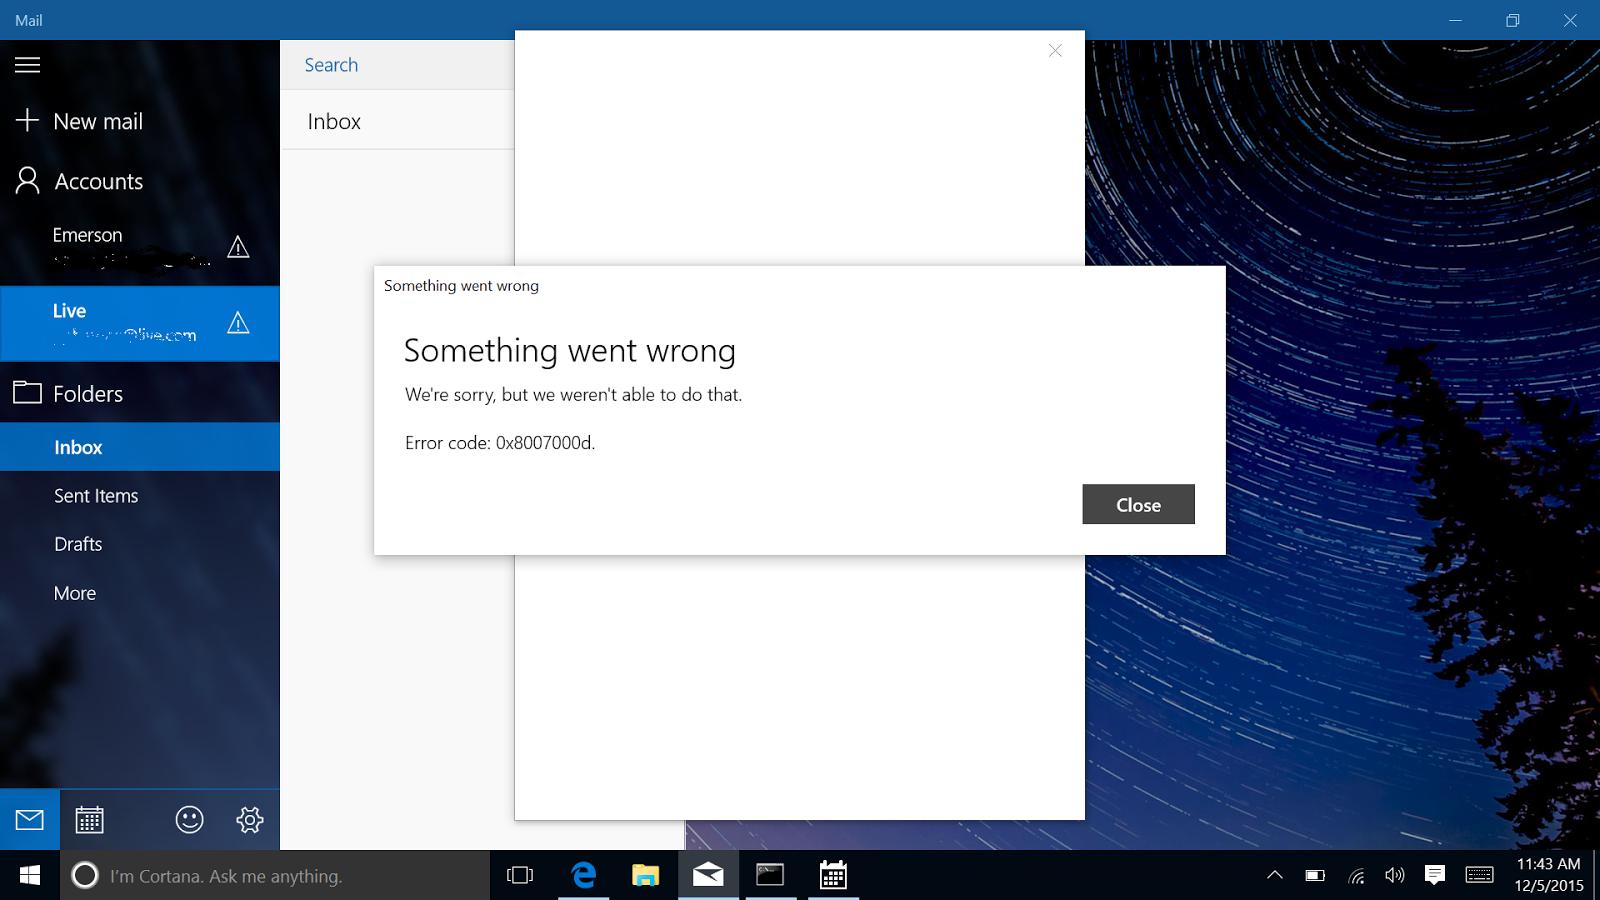 8thString: Windows 10 Mail app